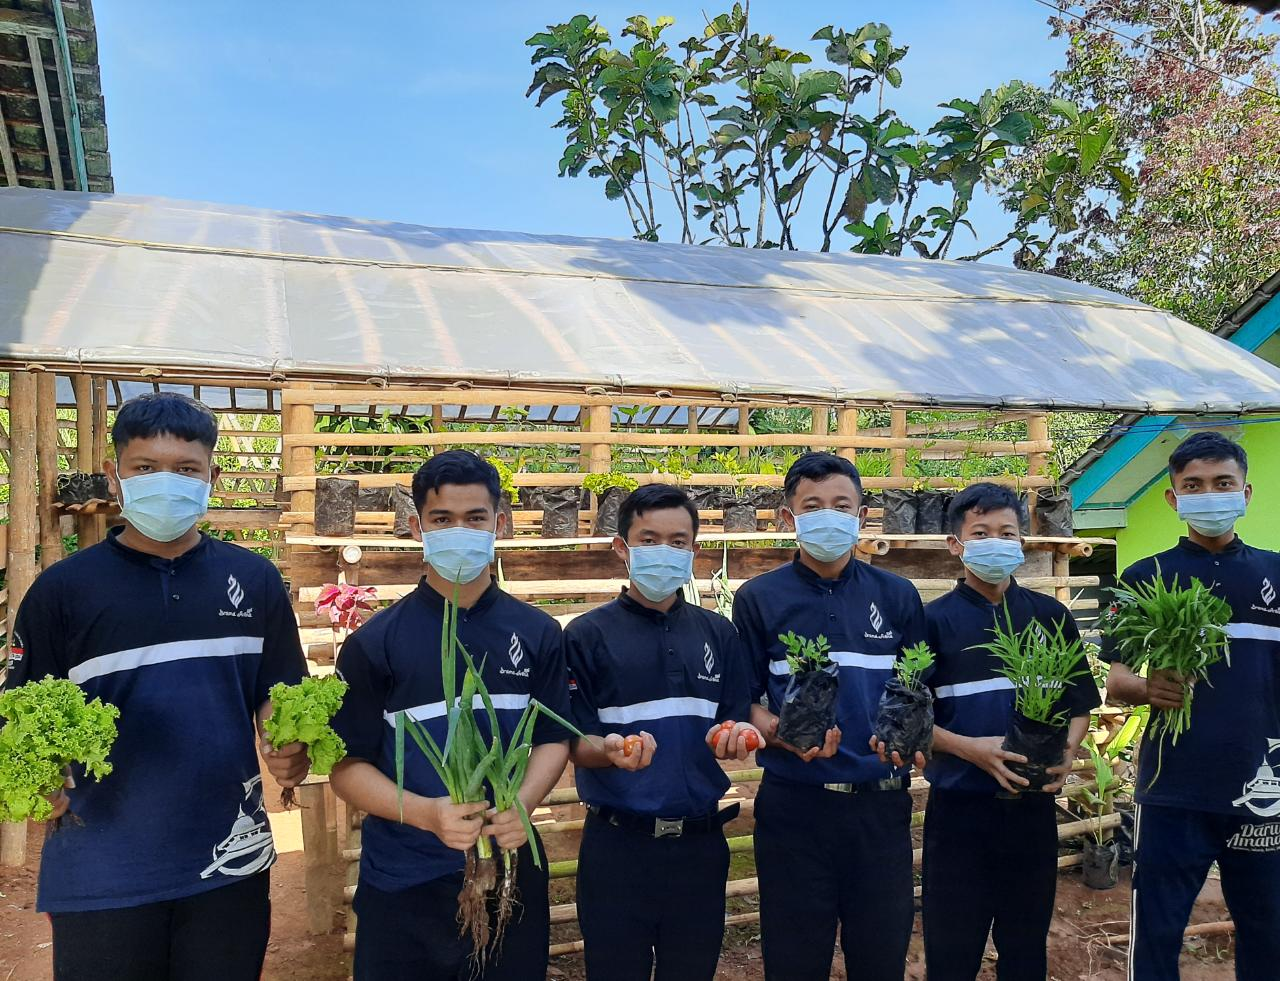 Wujud Kelestarian Hidup dan Kemandirian Pangan, Santri Pondok Pesantren Darul Amanah Panen Perdana Sayuran